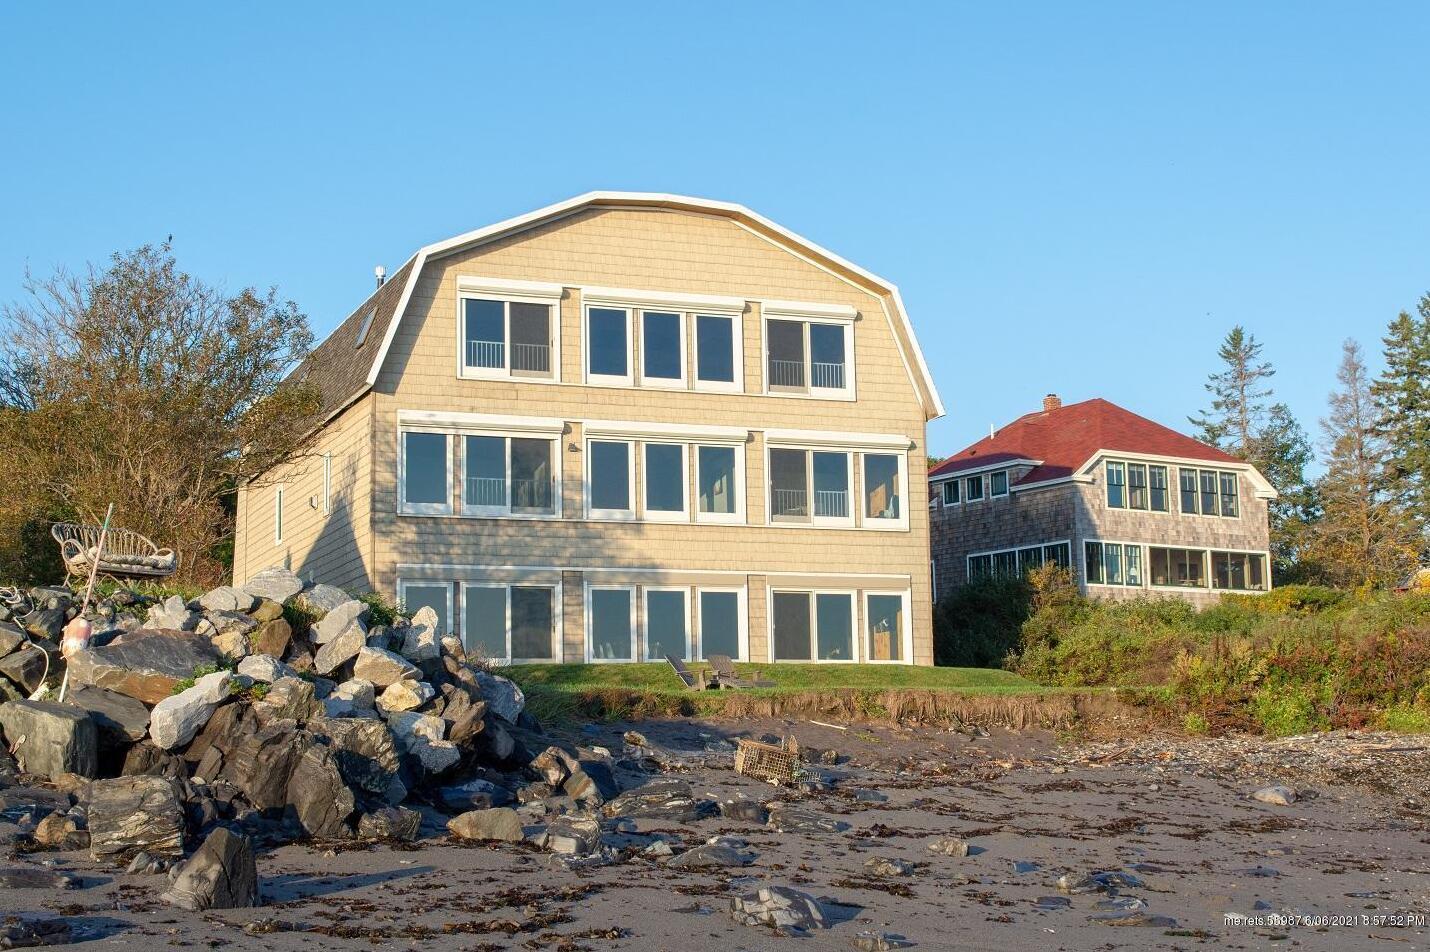 Photo of 52 Shipwreck Cove Road Cape Elizabeth ME 04107